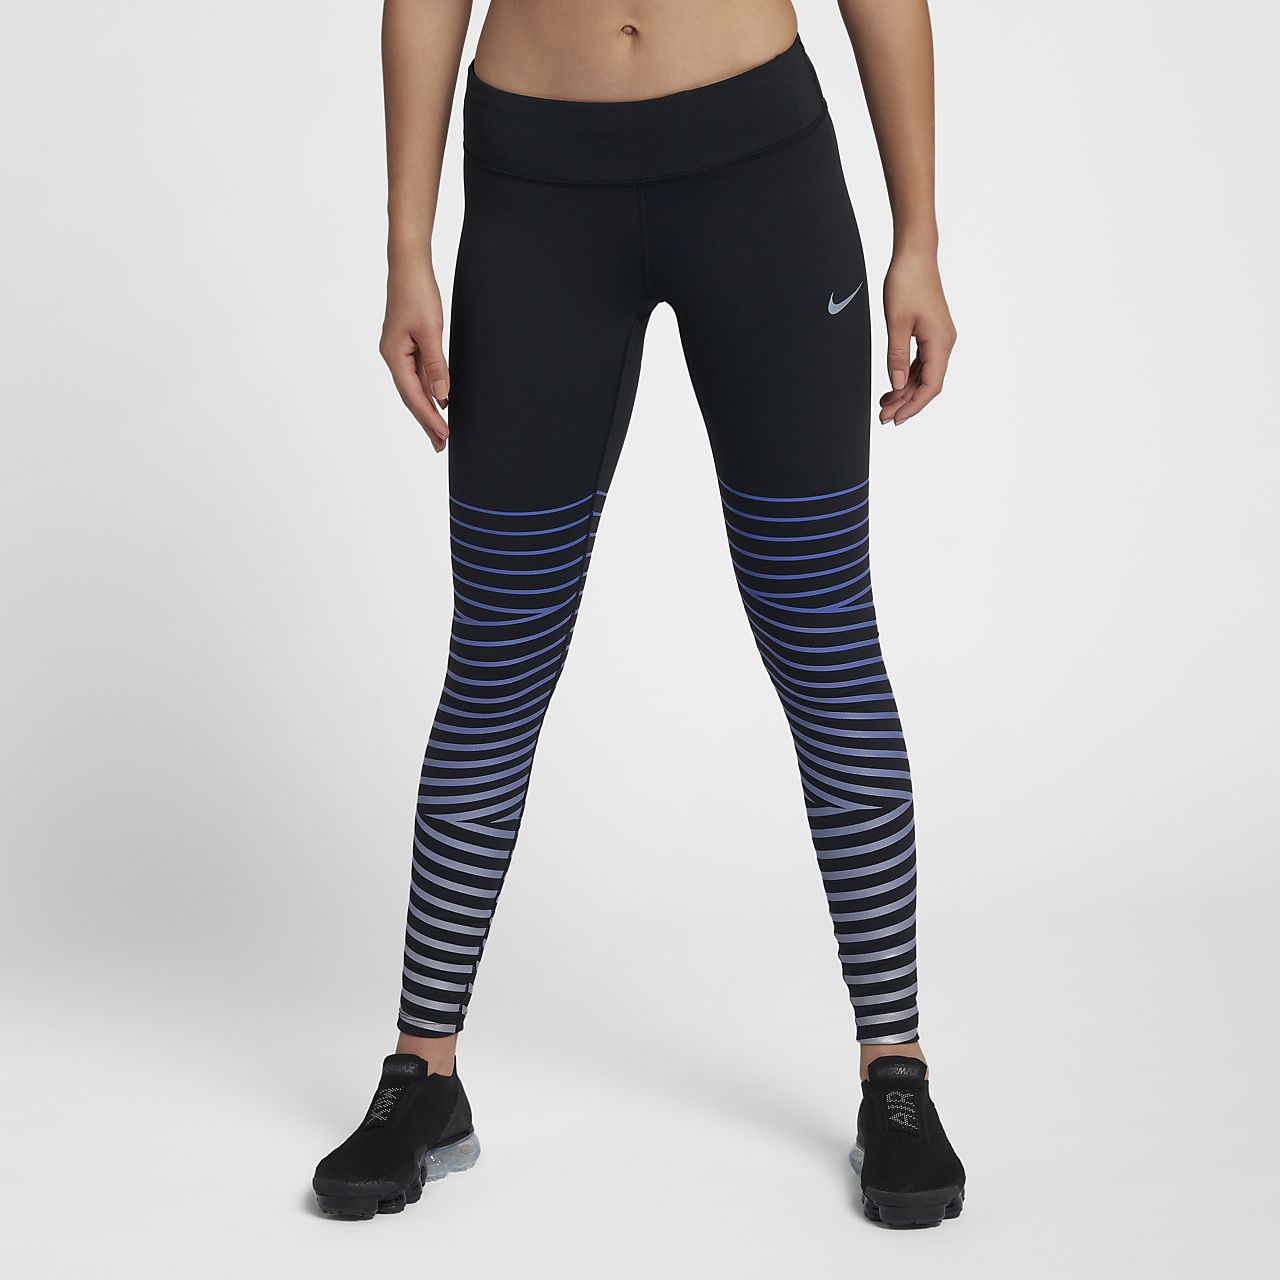 Nike Women's Epic Lux Flash Tight